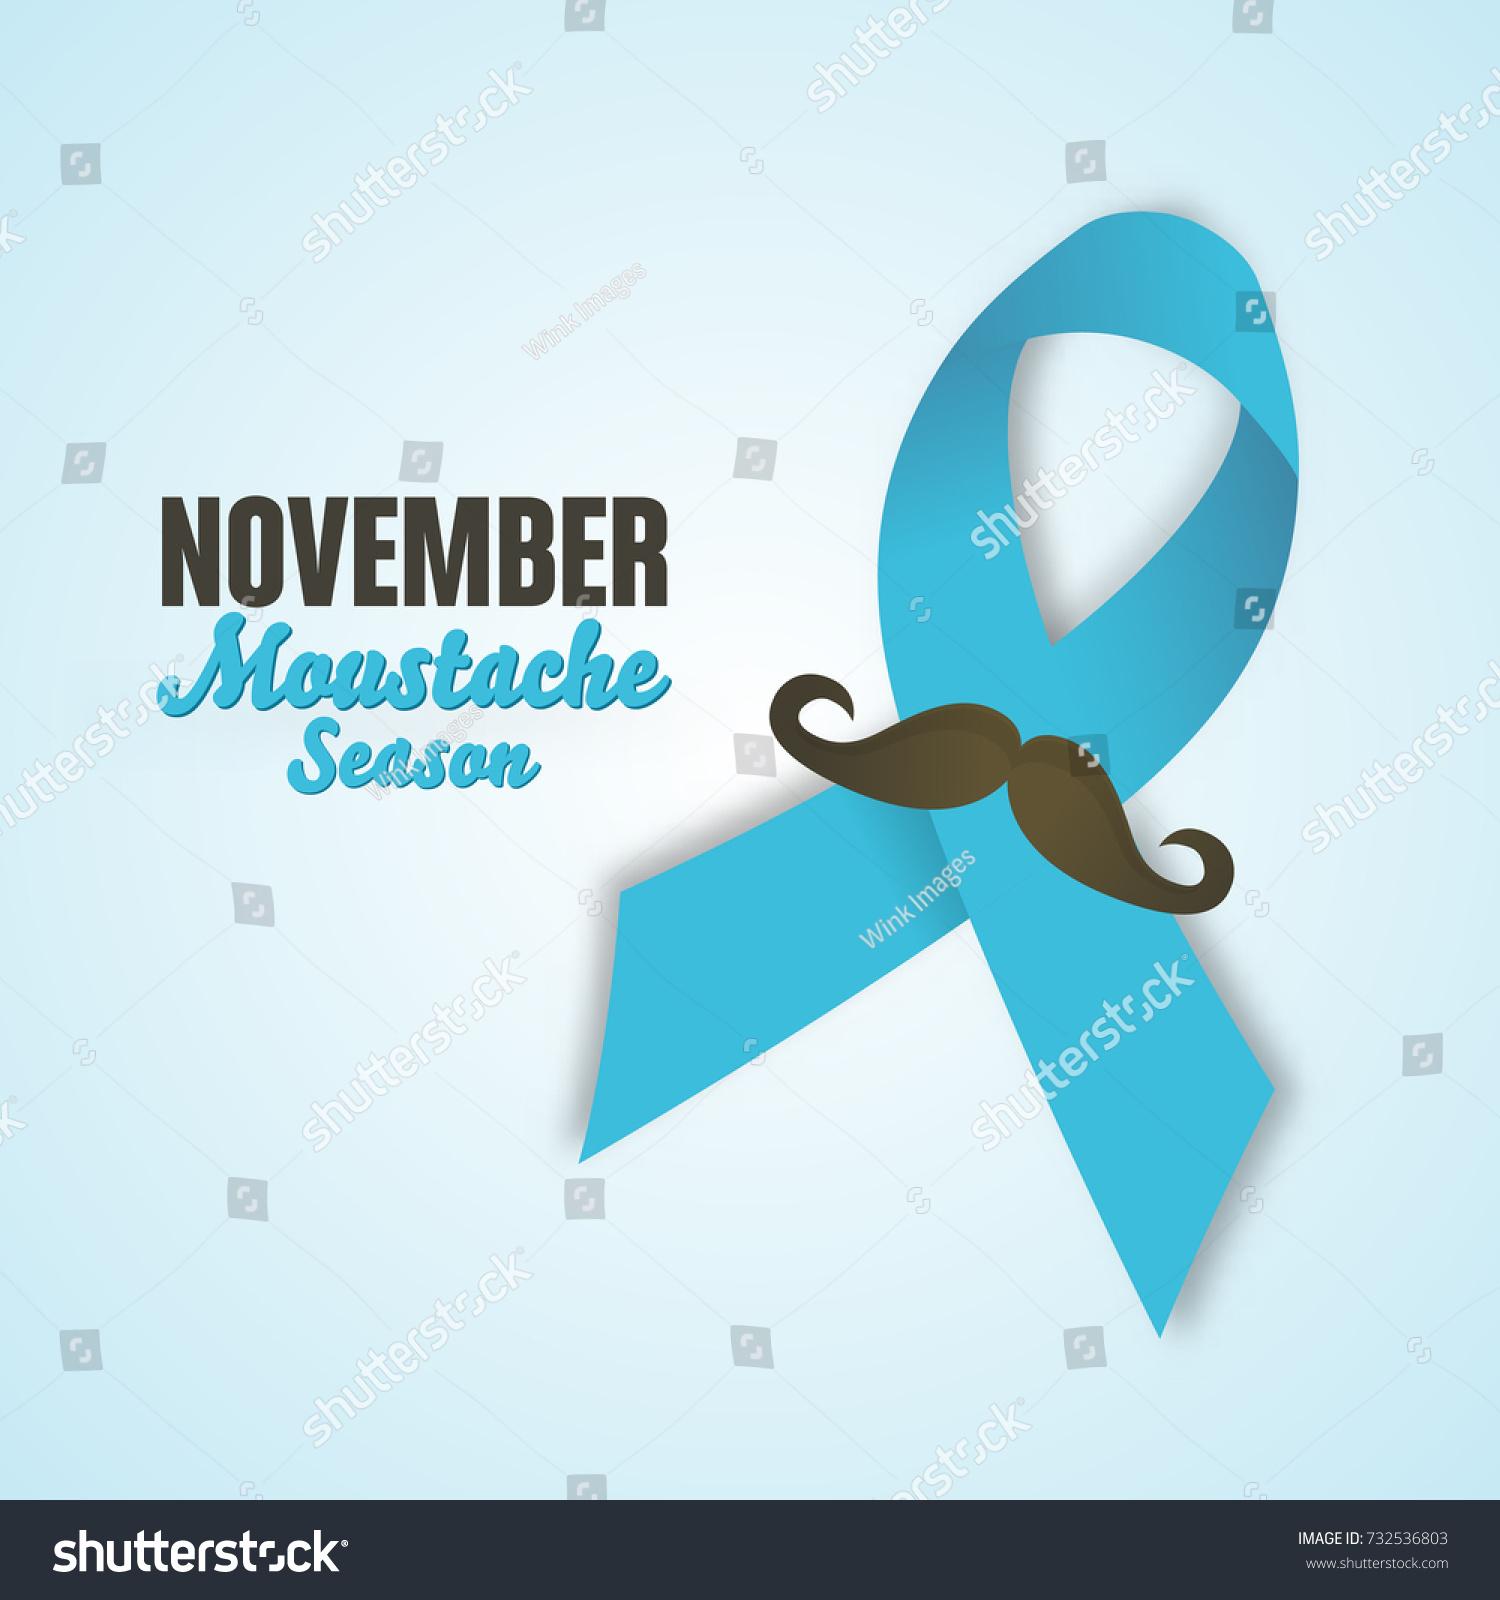 november prostate cancer awareness month design stock Cancer Ribbon Silhouette Ribbon Vector Black